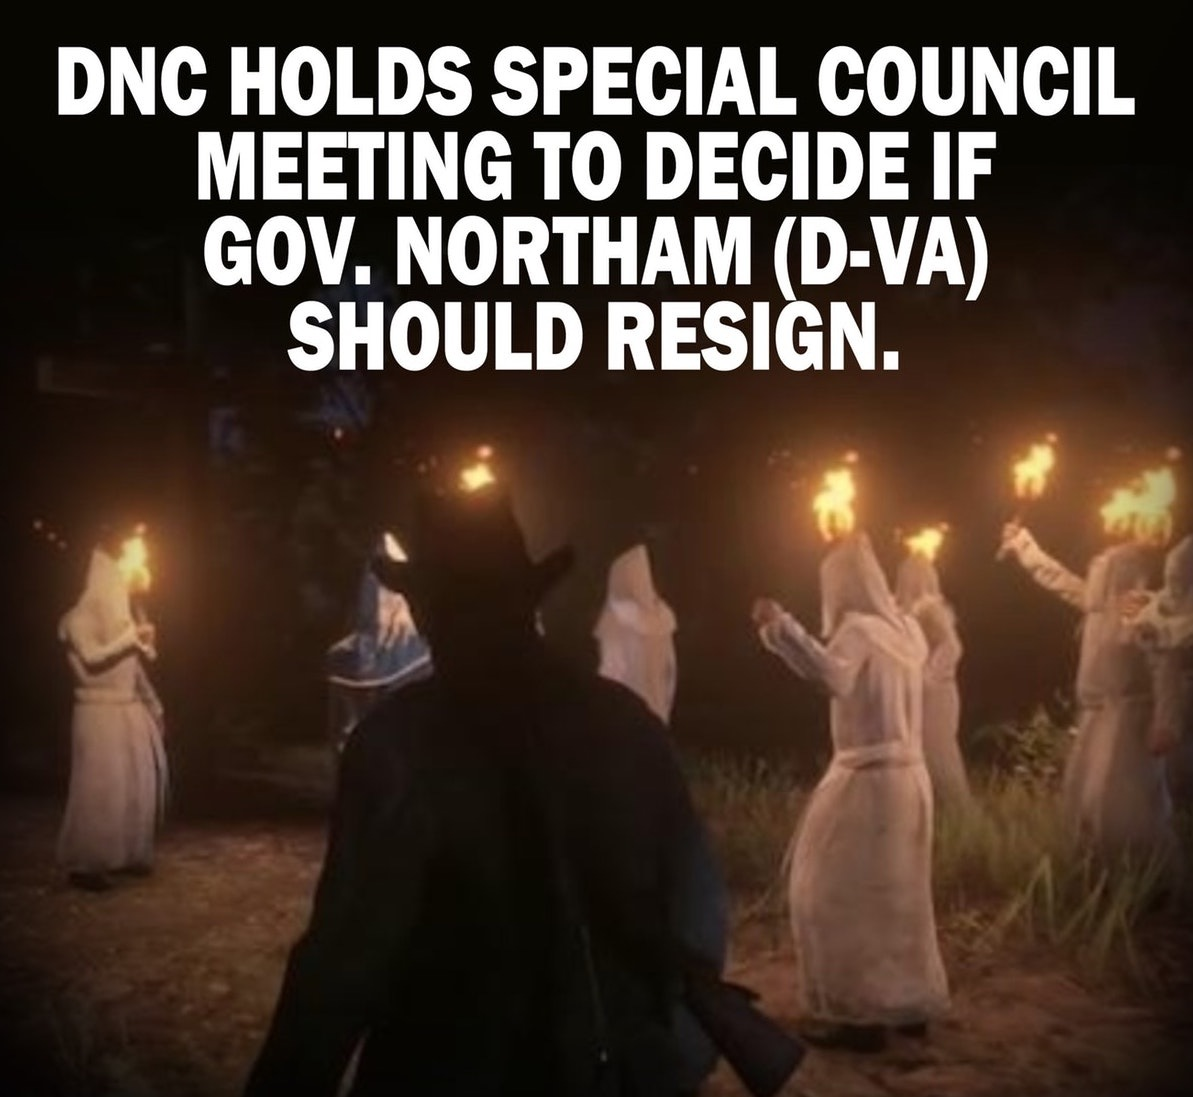 DNC-special-meeting.jpg